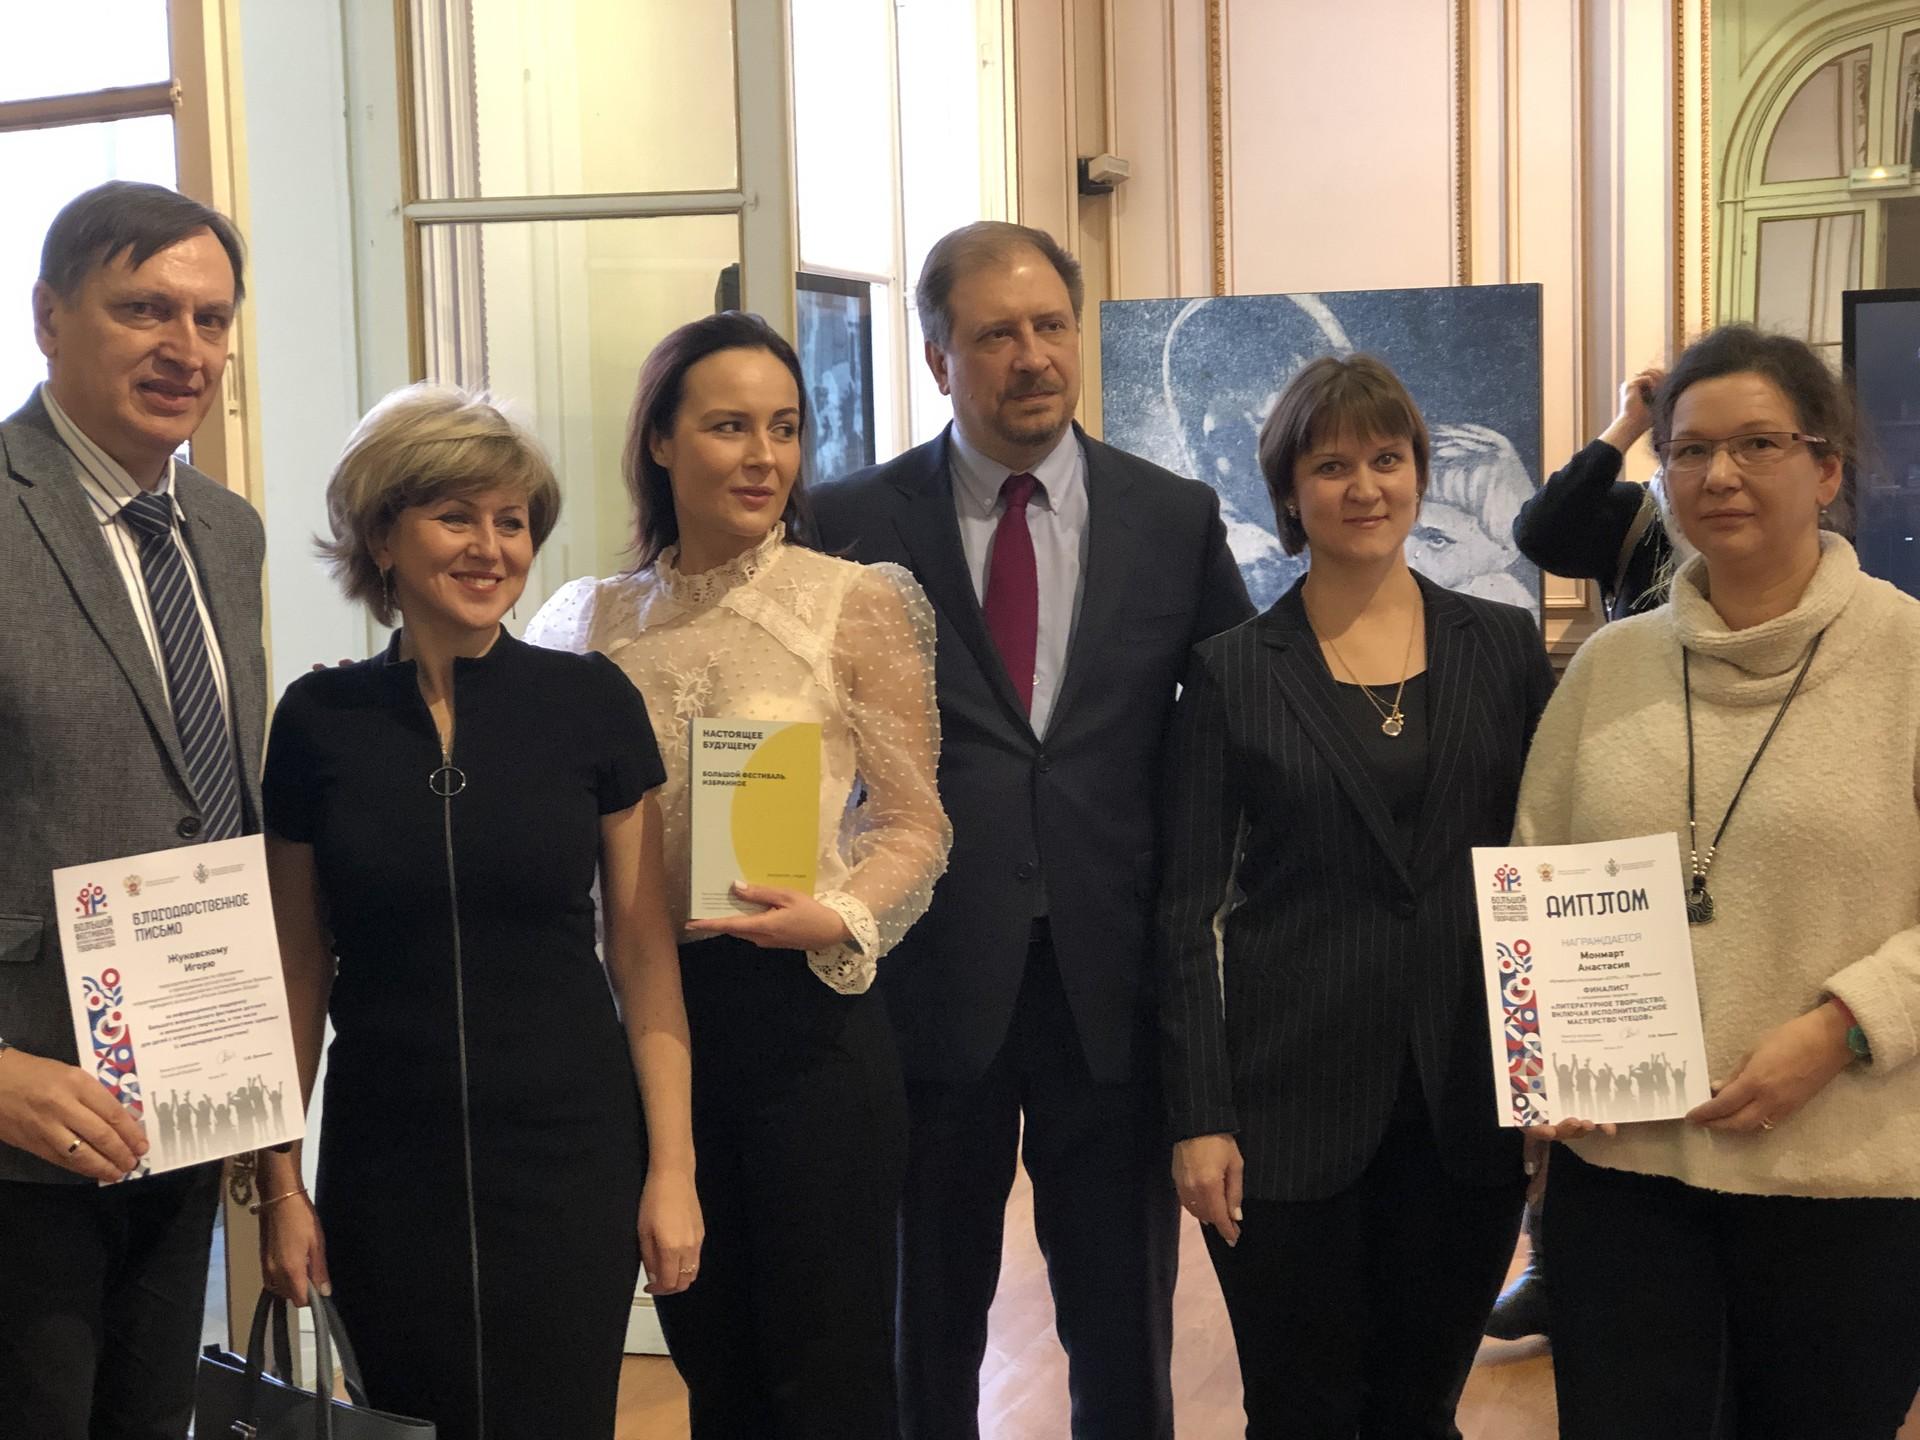 Igor Joukovski (Bordeaux), Oksana Gontcharova (Moscou), Anna Esparsa (Moscou), Konstantin Volkov (directeur du CRSC à Paris), Anna Gorina (Moscou) et Olga Montmartre-Lebedeva (Paris)